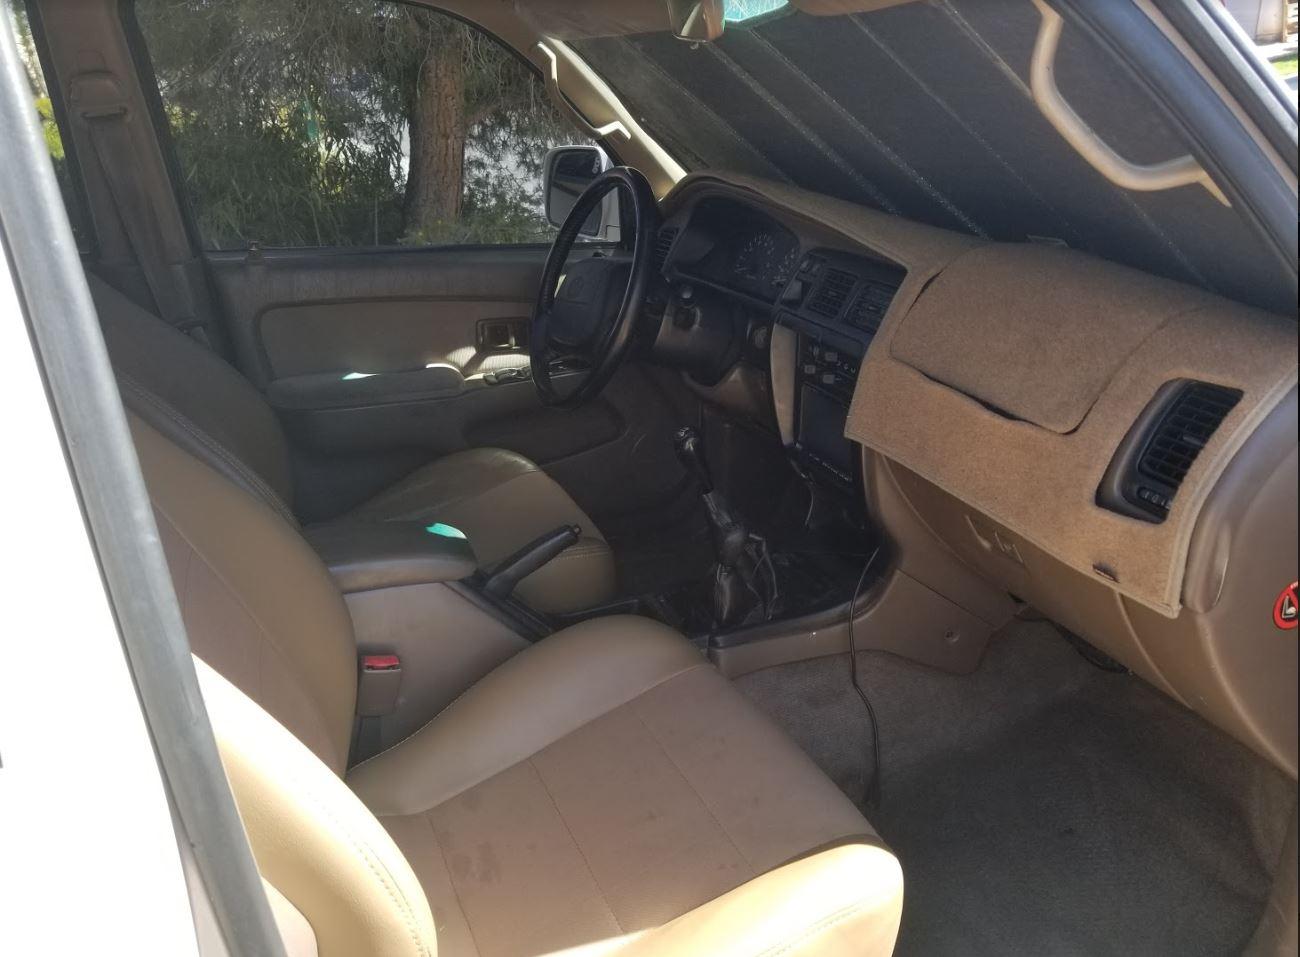 FS: 97 4runner 3.4L TRD Supercharged manual 4x4 - 999 Las Vegas,NV-5-jpg